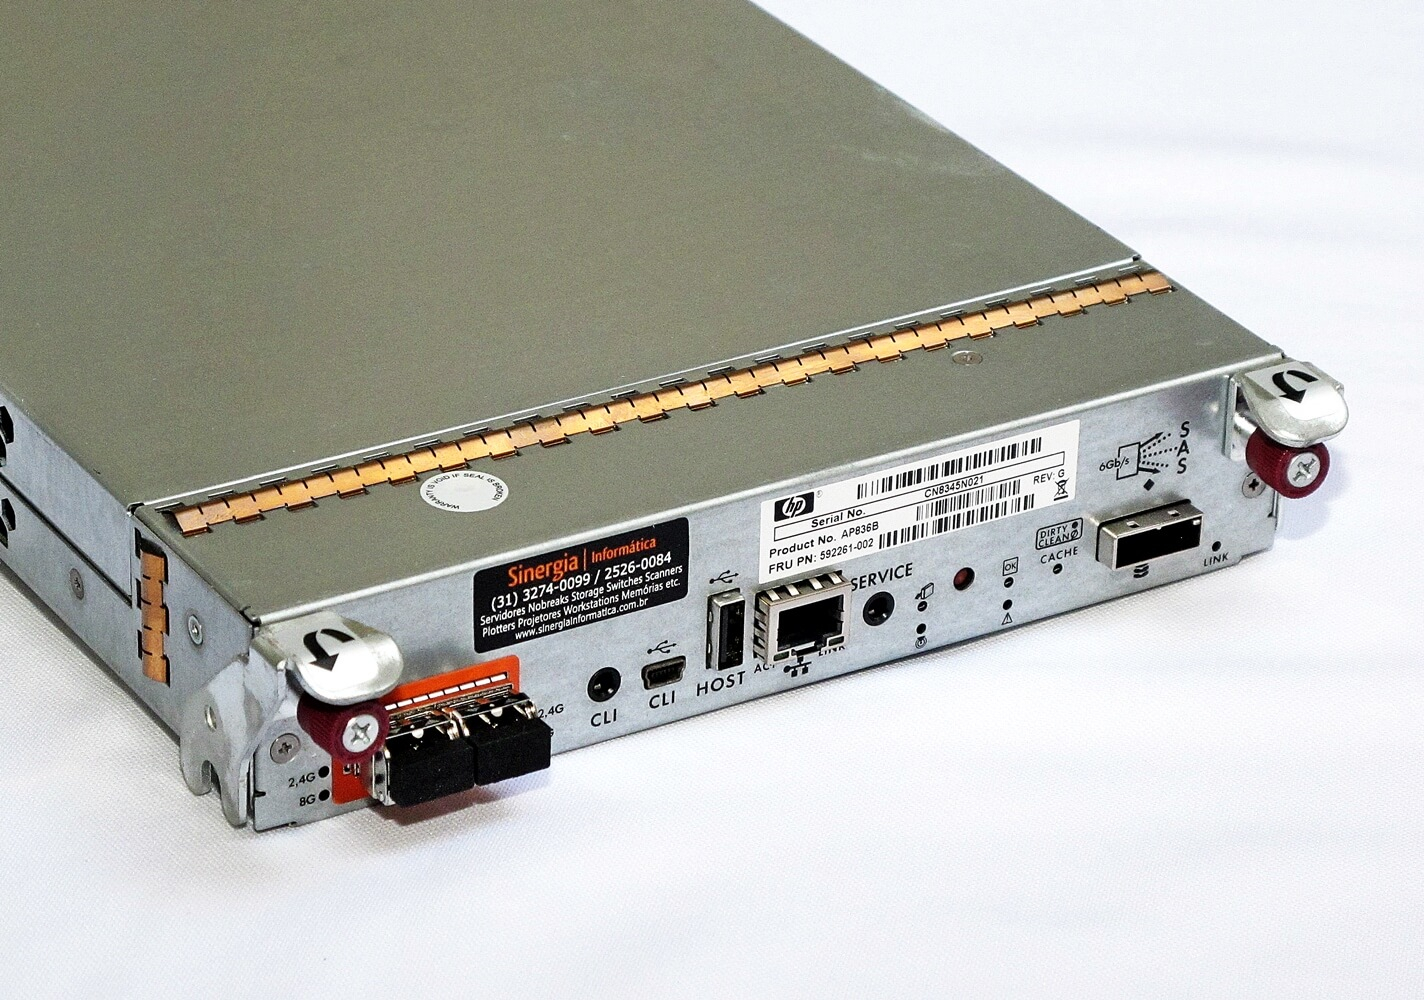 AP836B Controladora HPE MSA StorageWorks P2000 G3 Dual Port Fibre Channel 8Gb pronta entrega